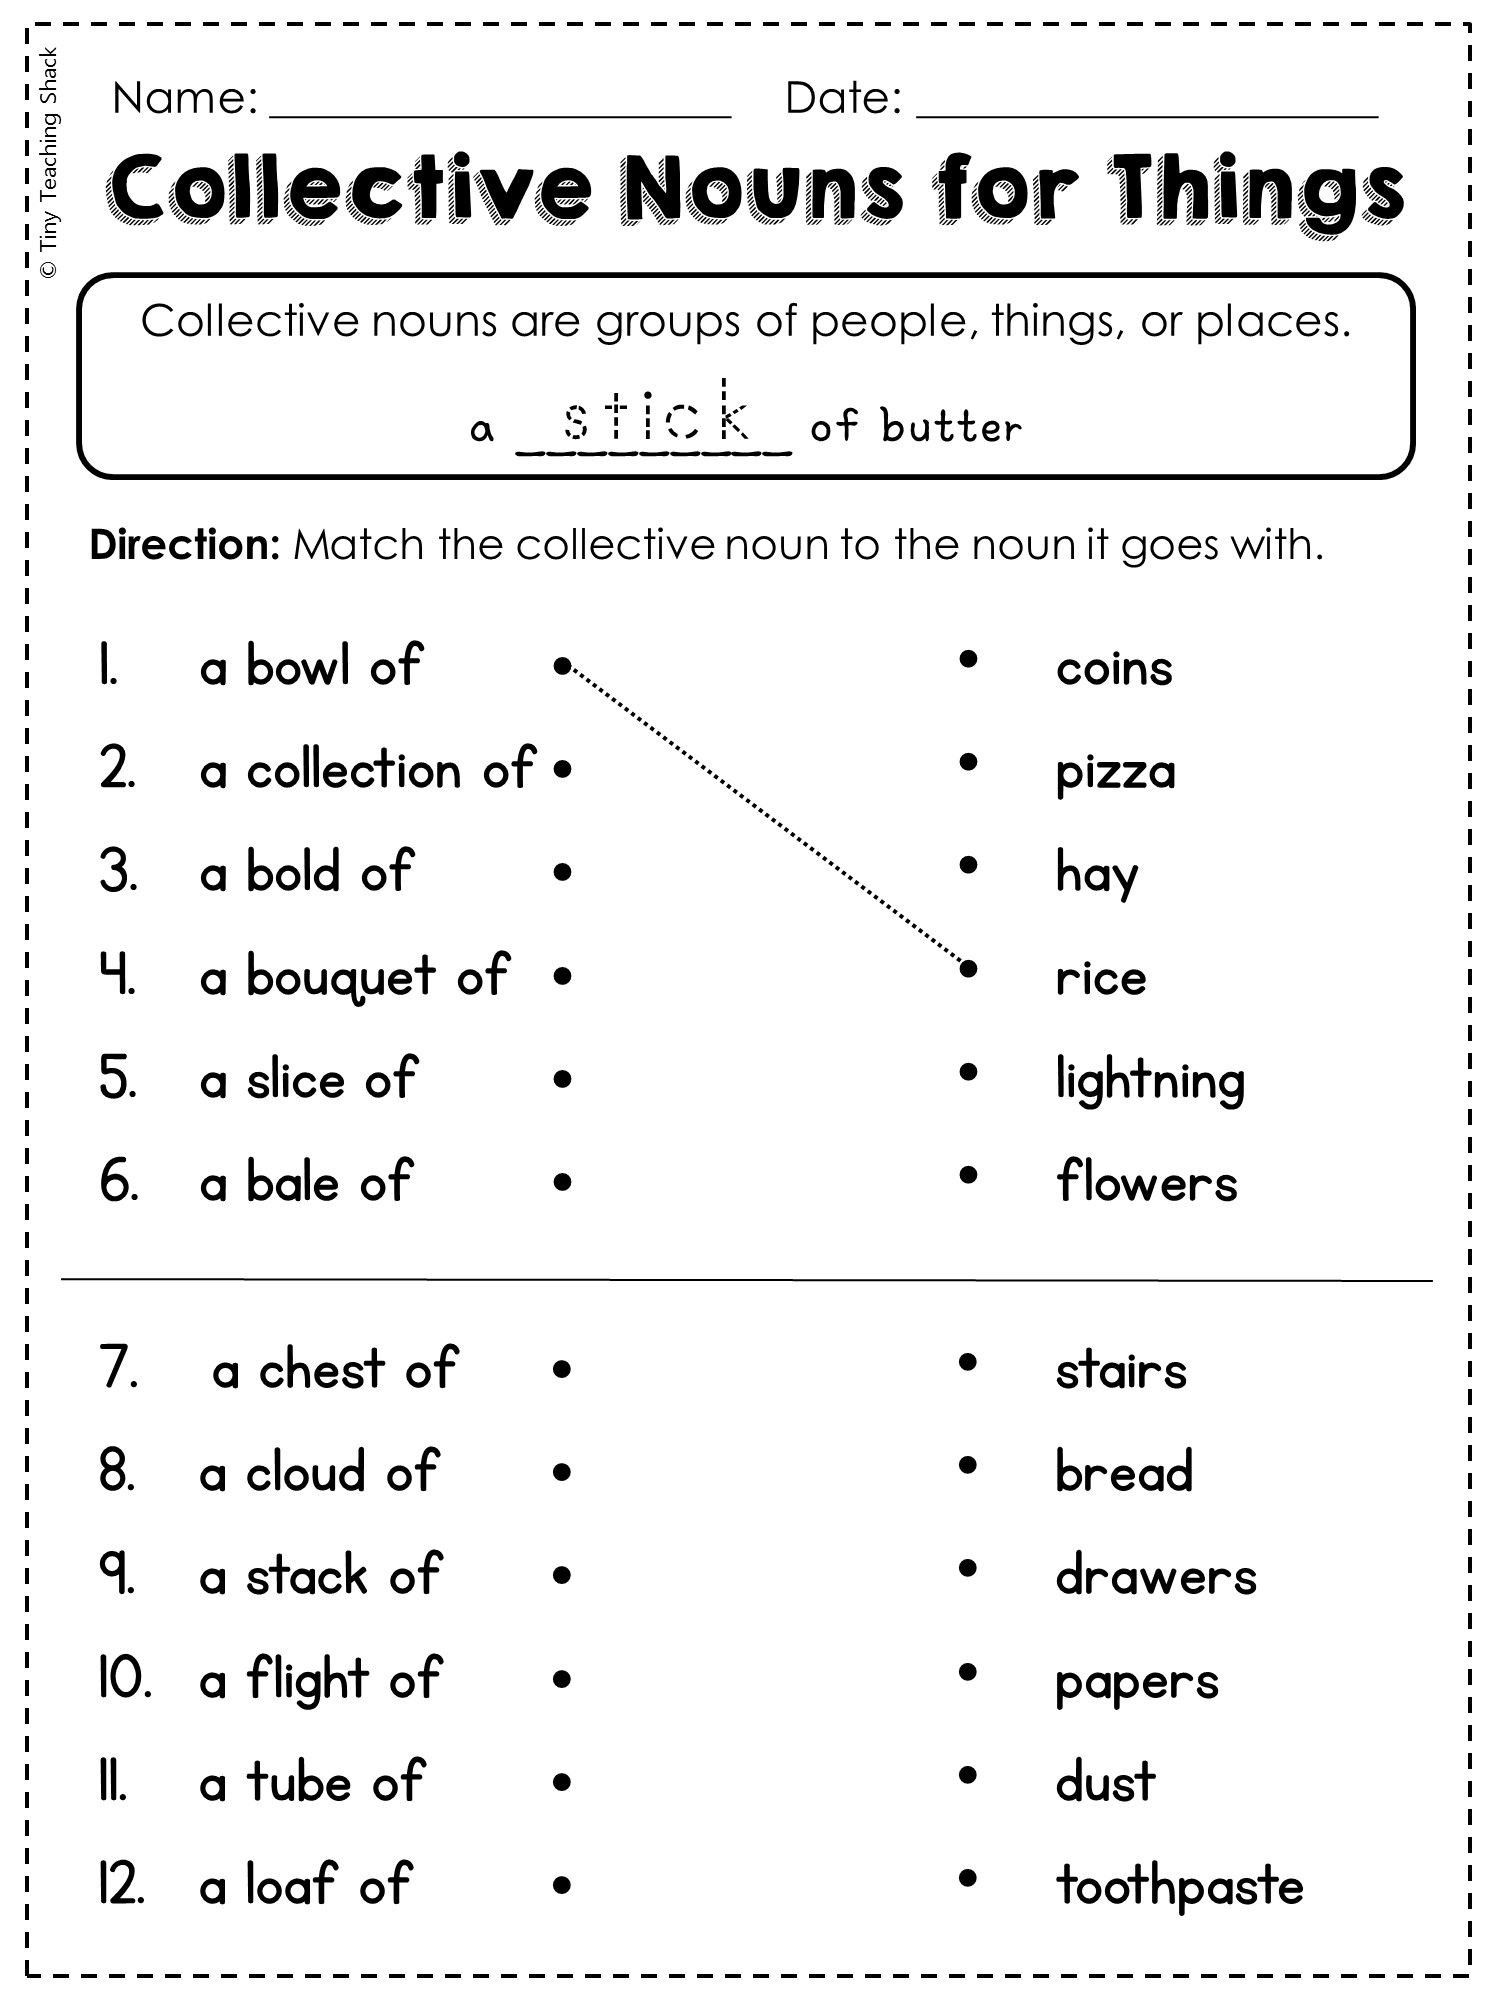 medium resolution of Second Grade Grammar Worksheets 2nd Grade Language Arts and Grammar  Practice Sheets Freebie   Collective nouns worksheet